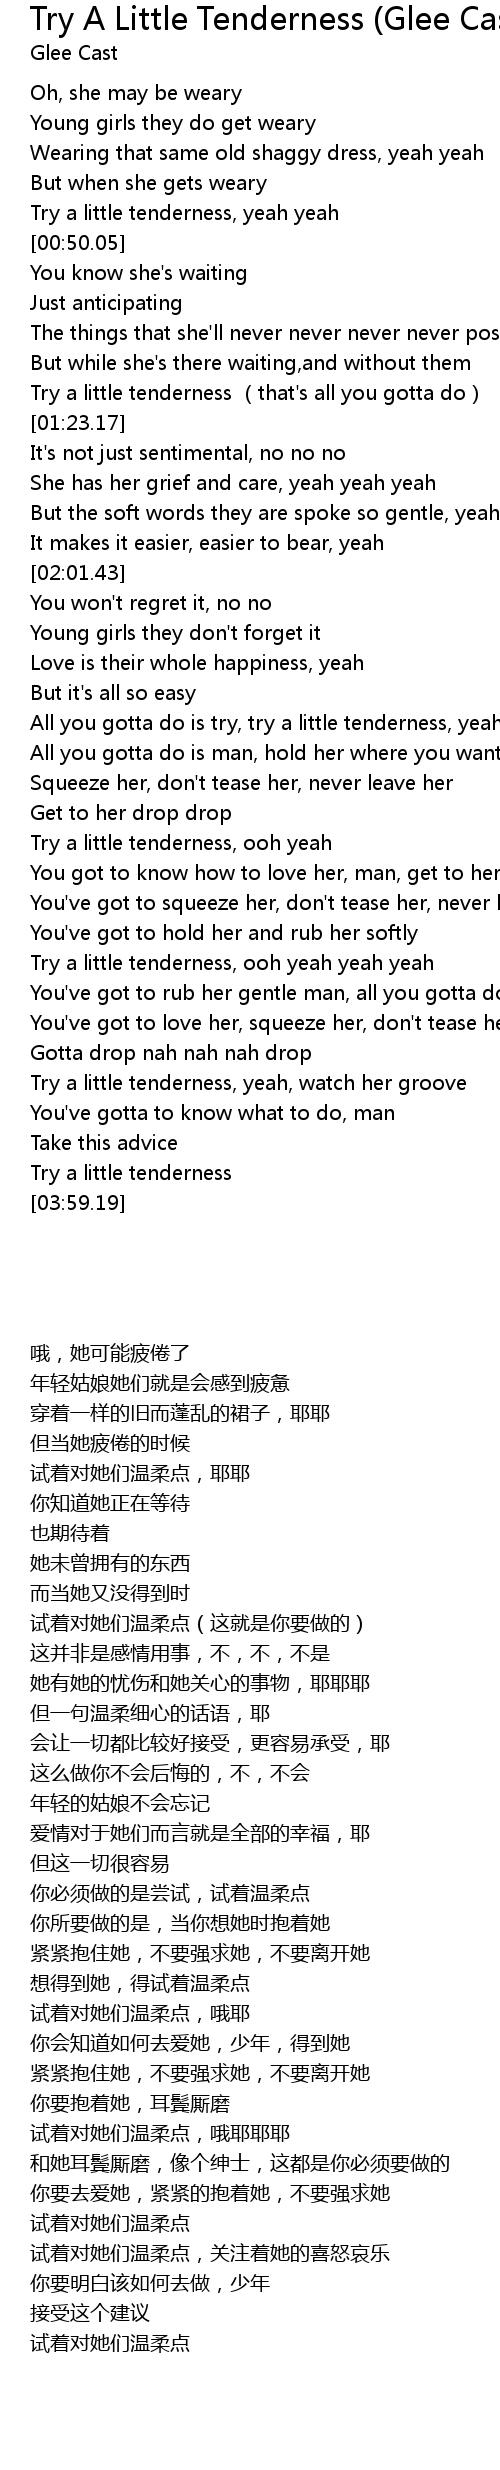 Try A Little Tenderness Glee Cast Version Lyrics   Follow Lyrics